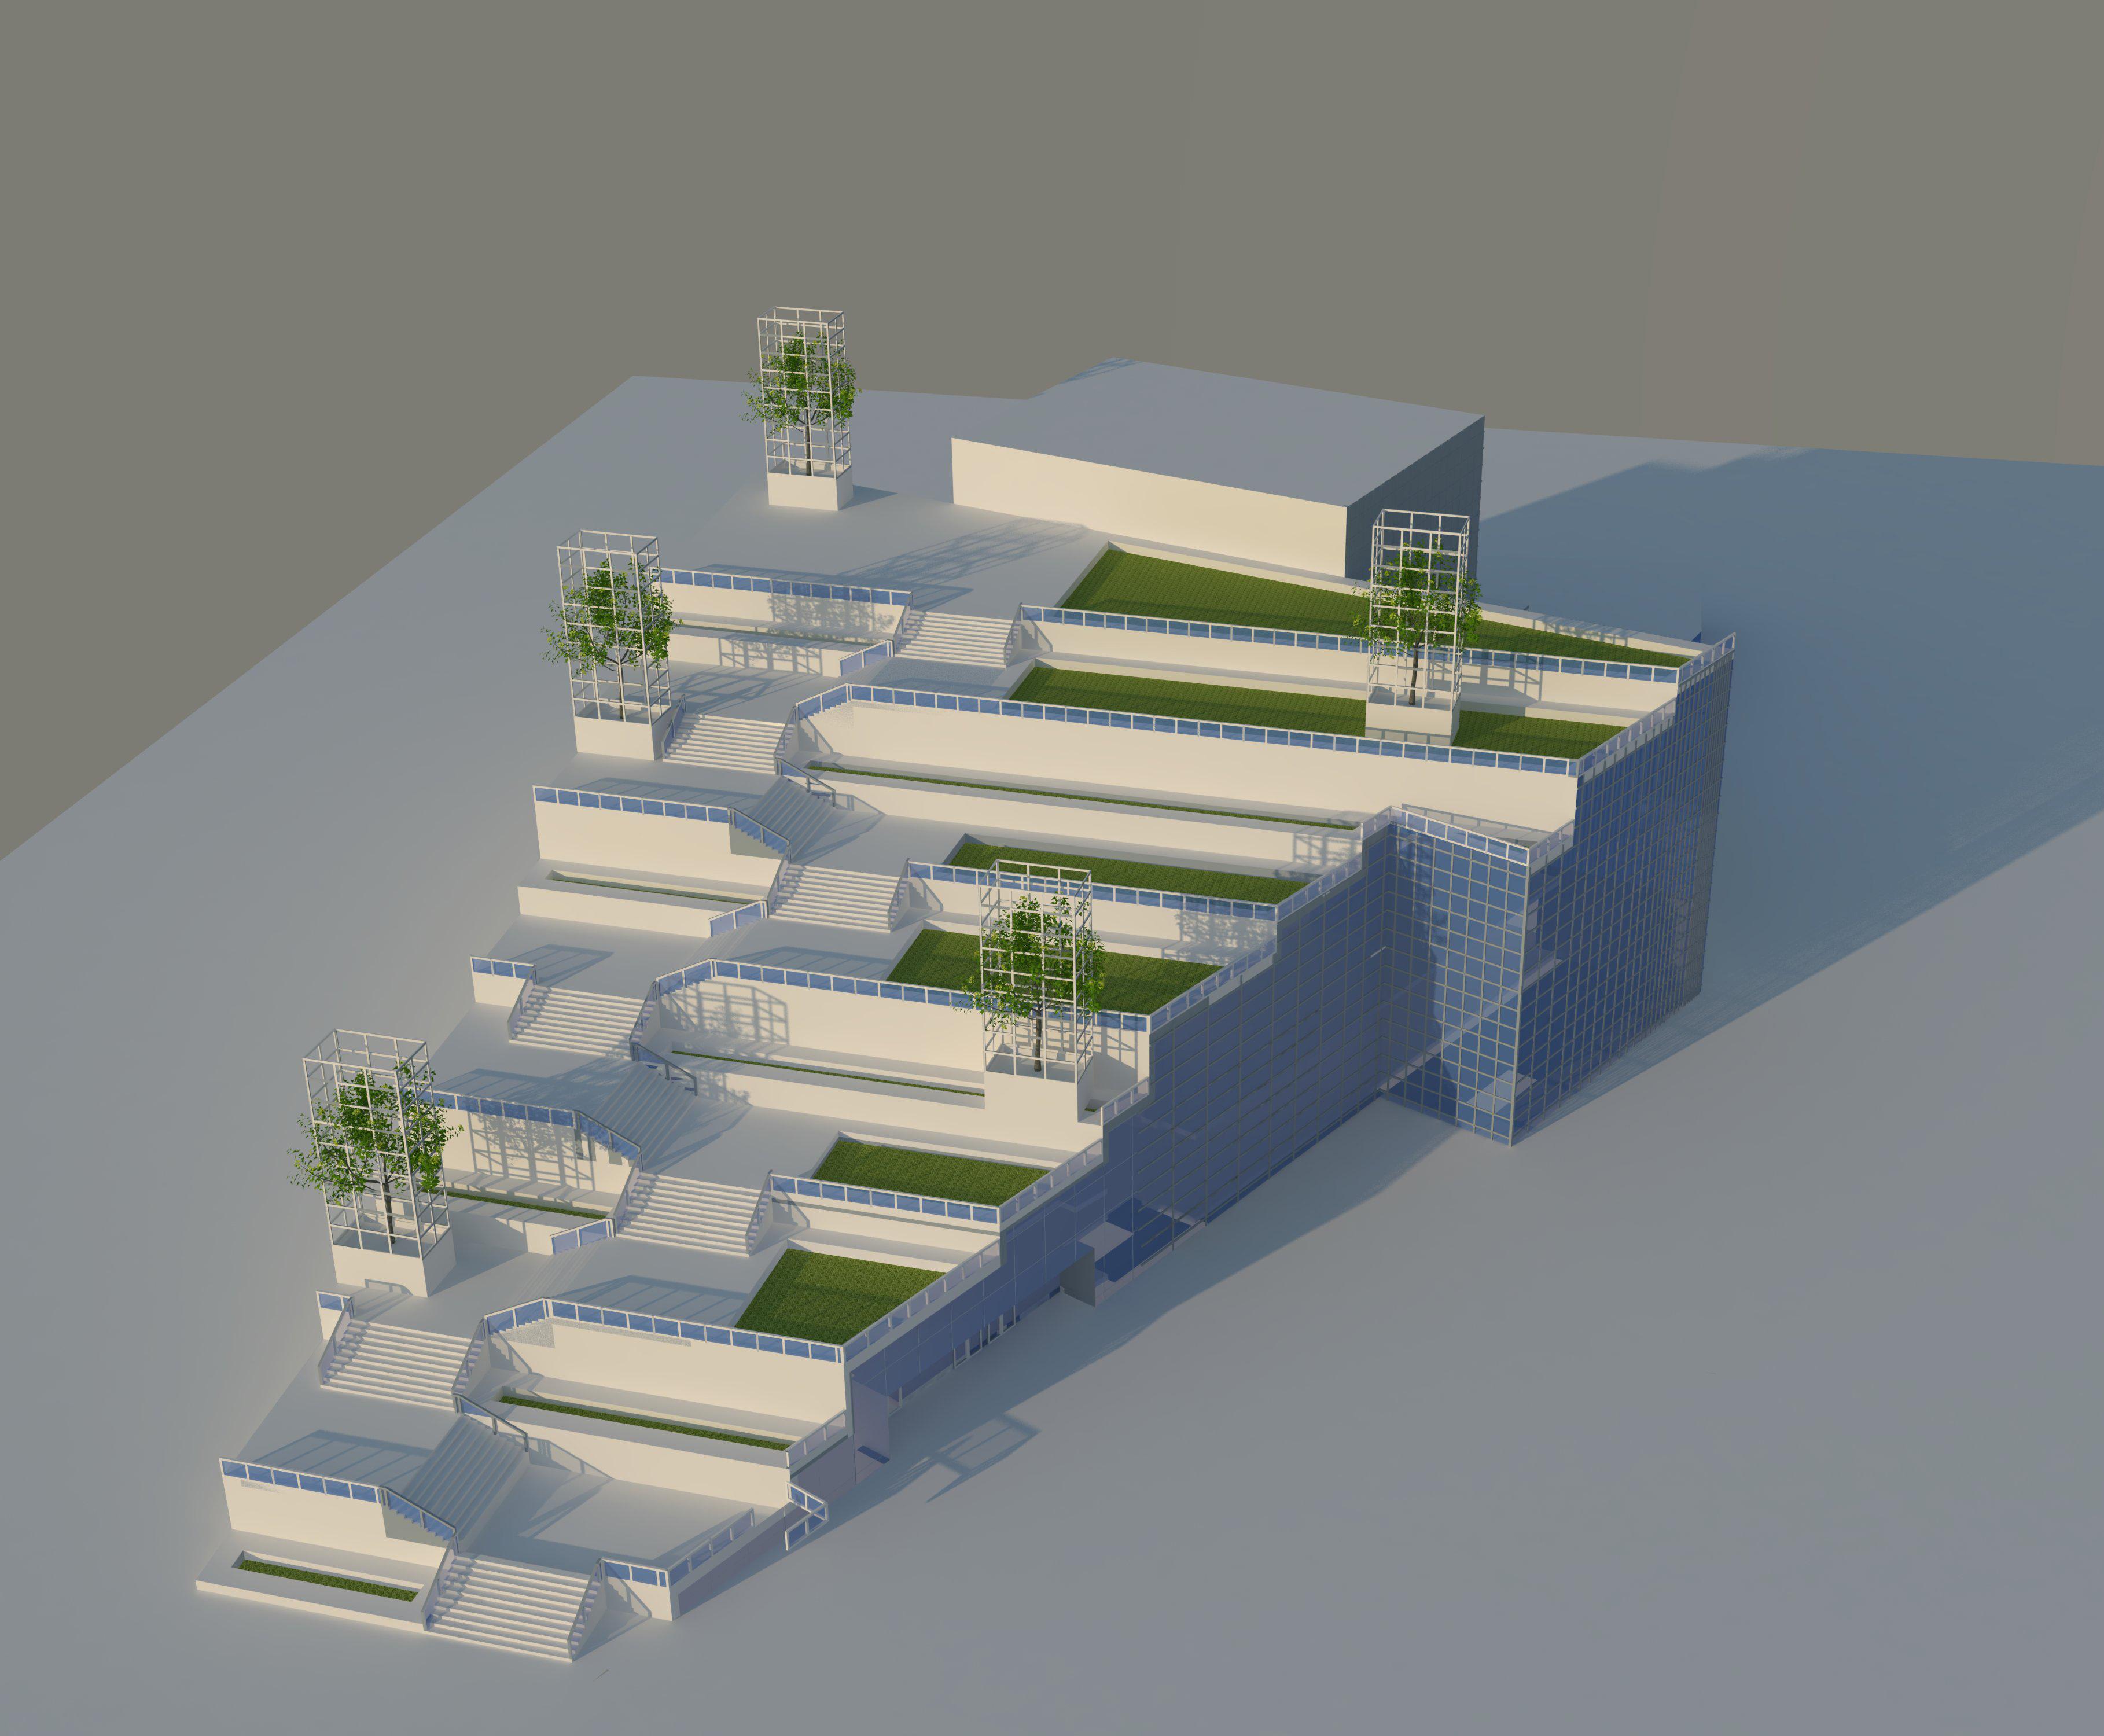 Разработка архитектурной концепции театра оперы и балета фото f_25252f0cebf3daa8.jpg